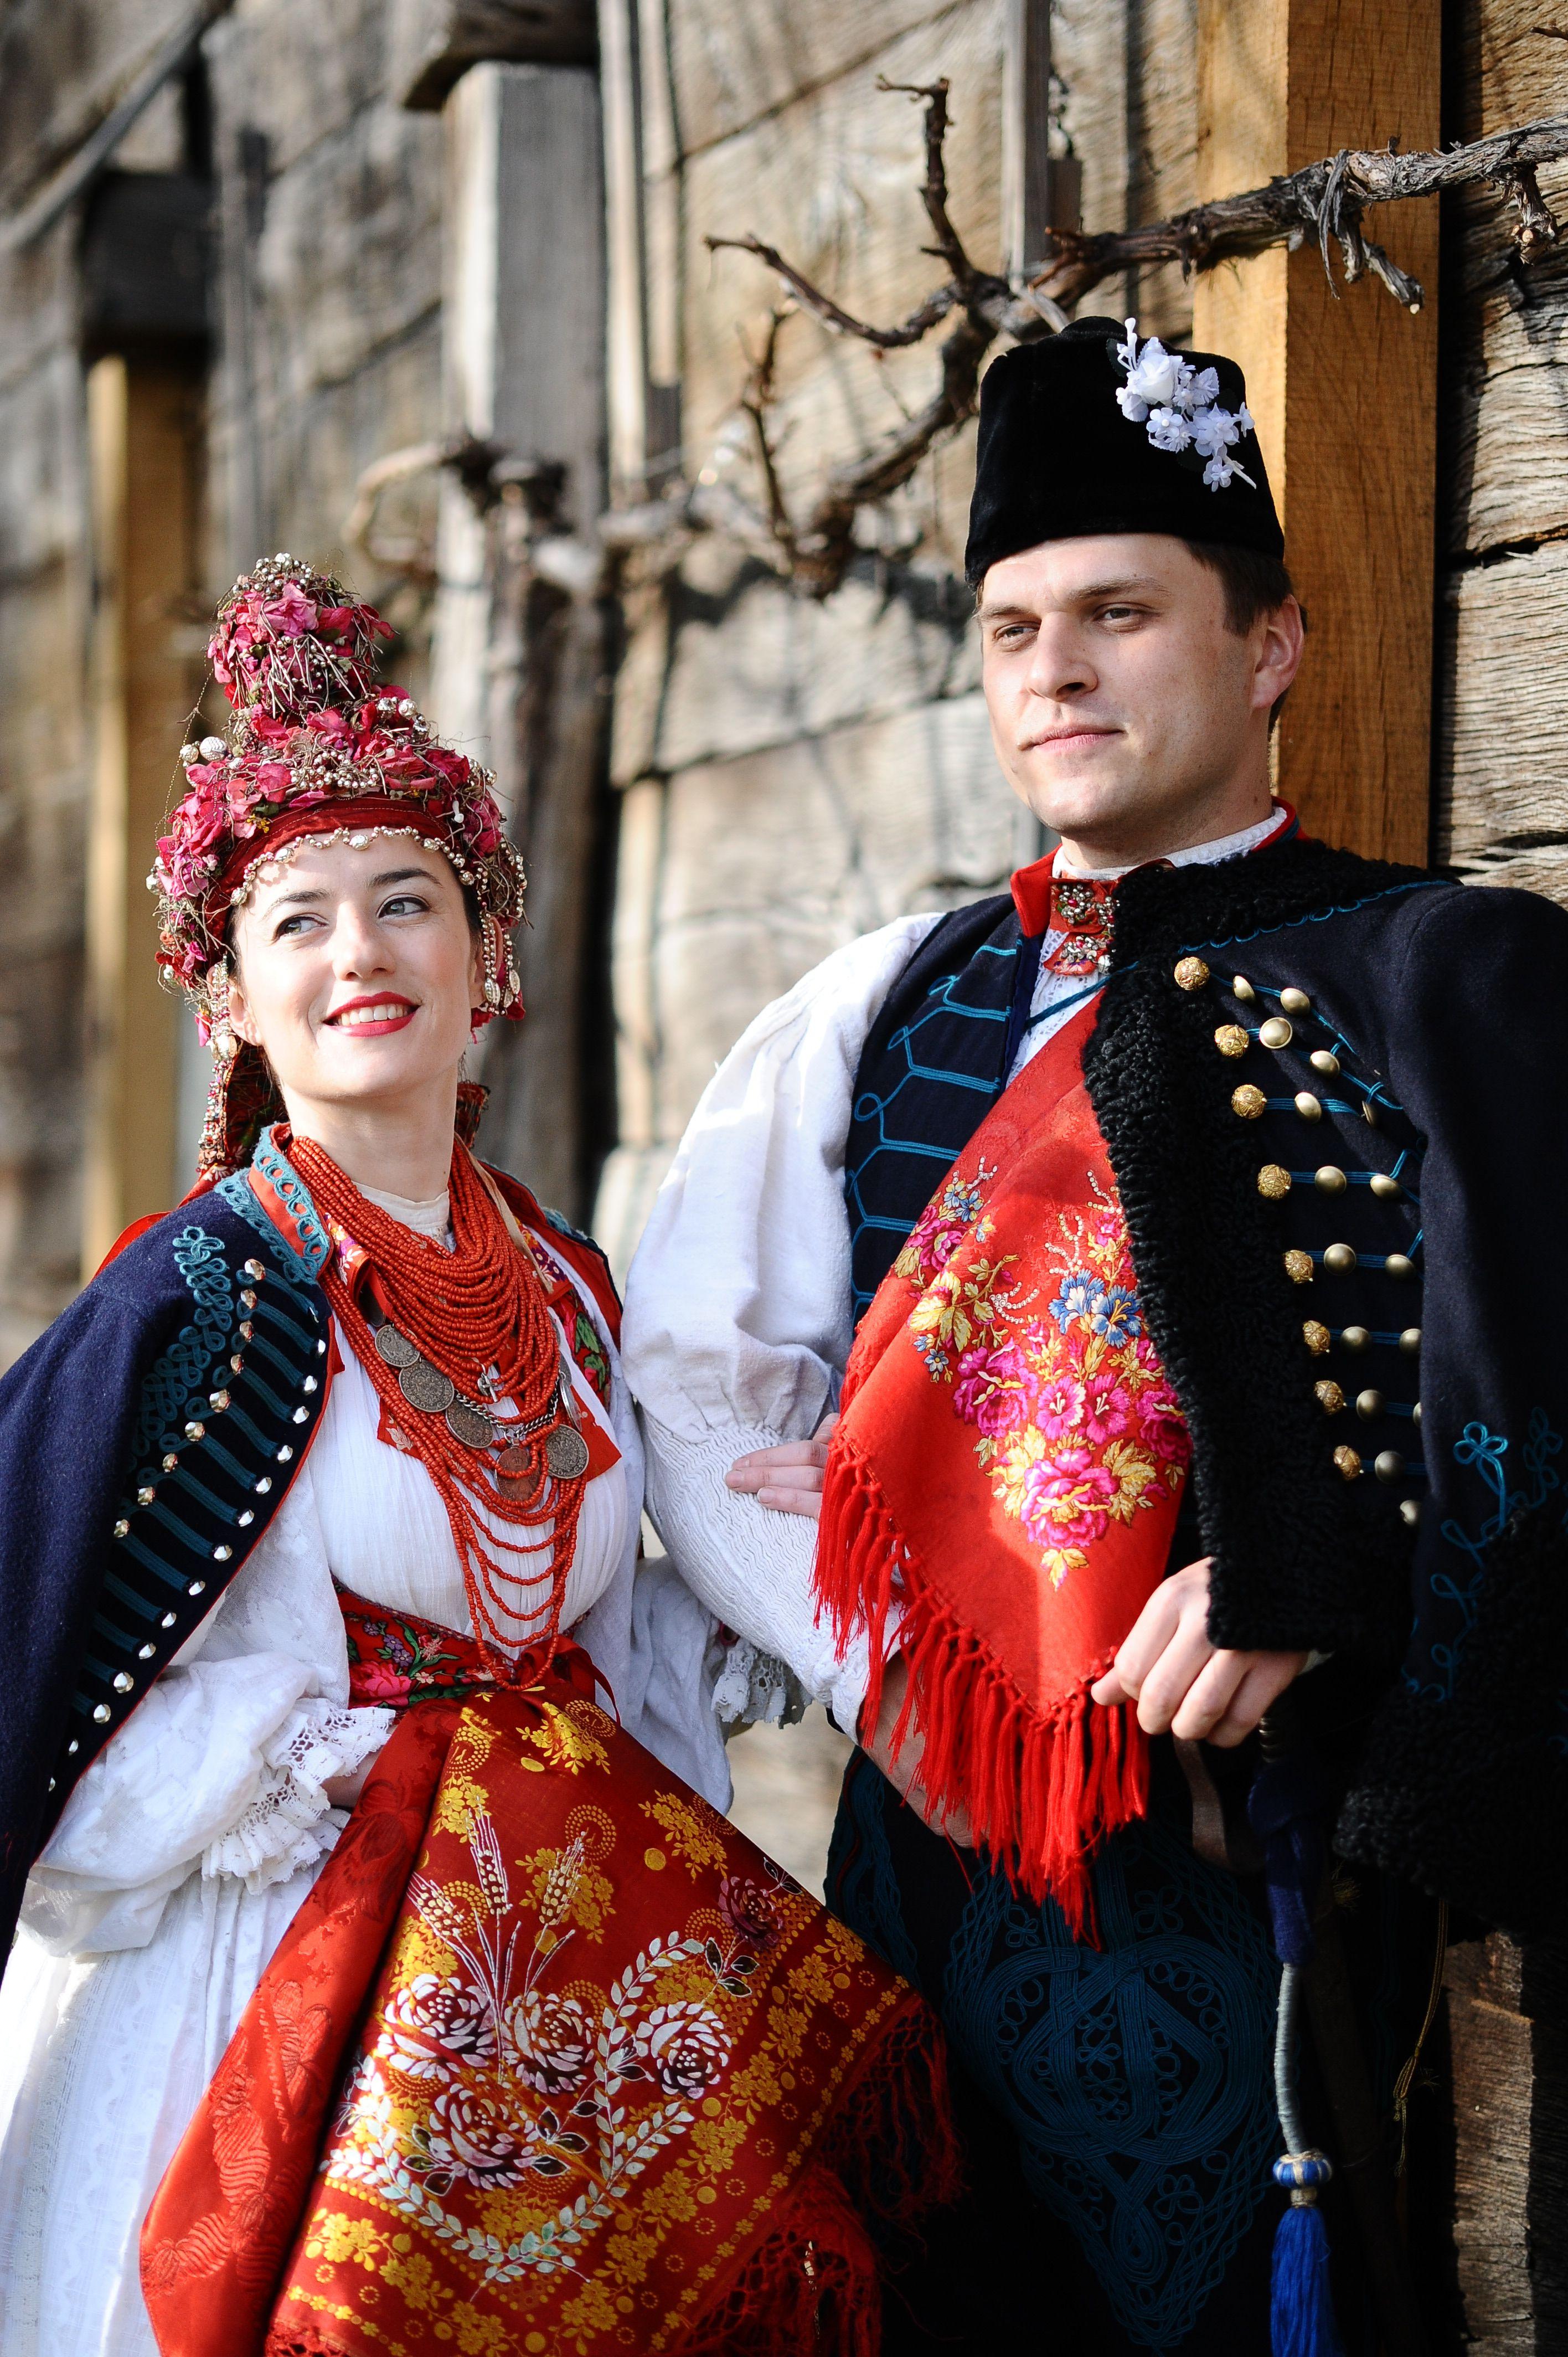 Croatia Turopolje Narodna Nosnja Turopolja Turopoljska Svadba Mladenci Iz Turopolja Zbirkagp Traditional Outfits Rare Clothing National Dress